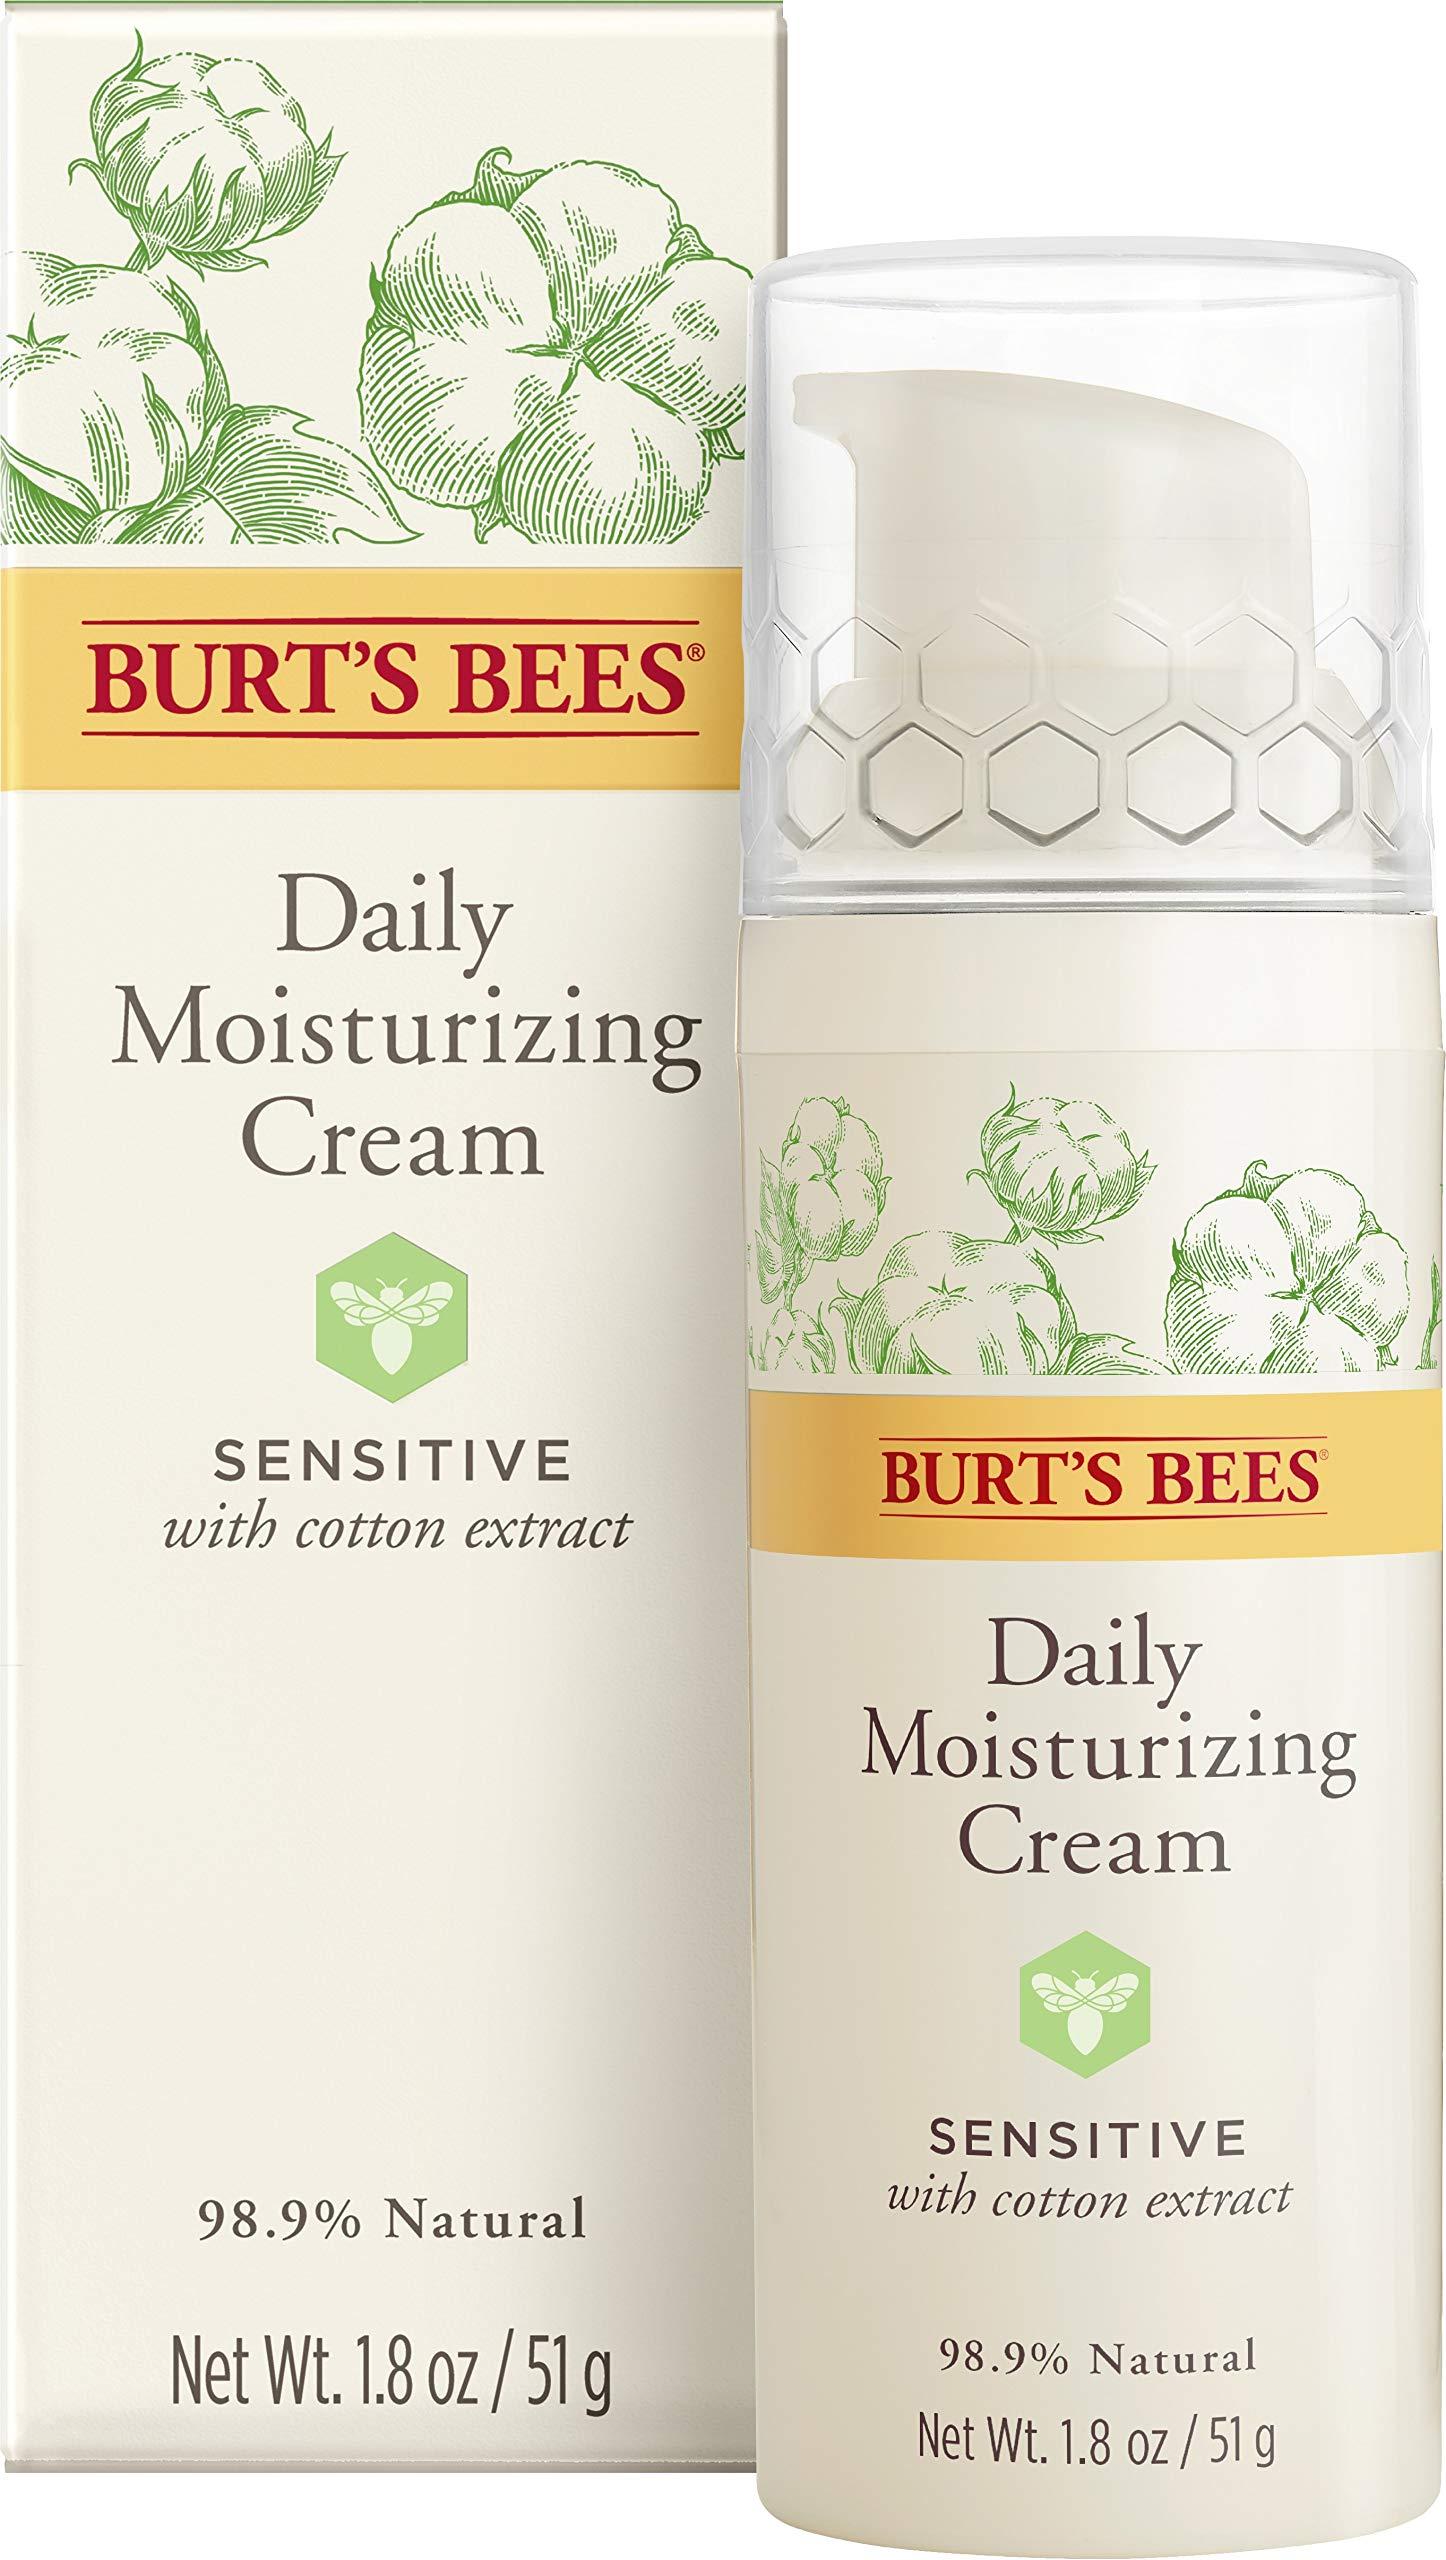 Burt's Bees Daily Face Moisturizer Cream for Sensitive Skin, 1.8 Ounces by Burt's Bees